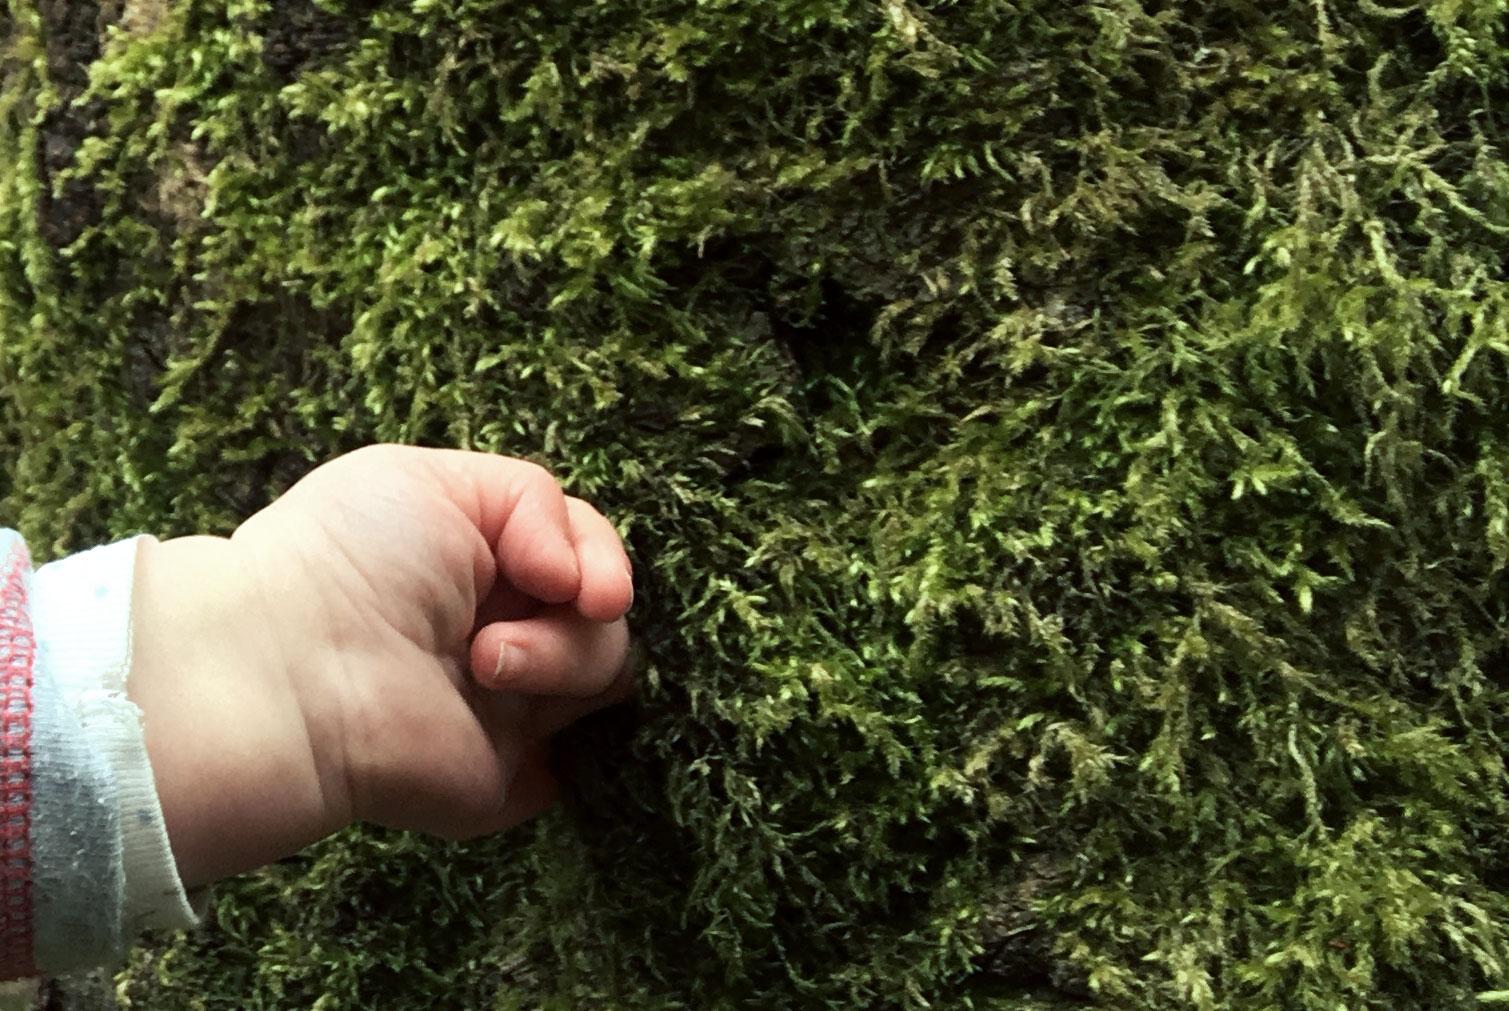 Baby-Hand berührt Baum mit Moss